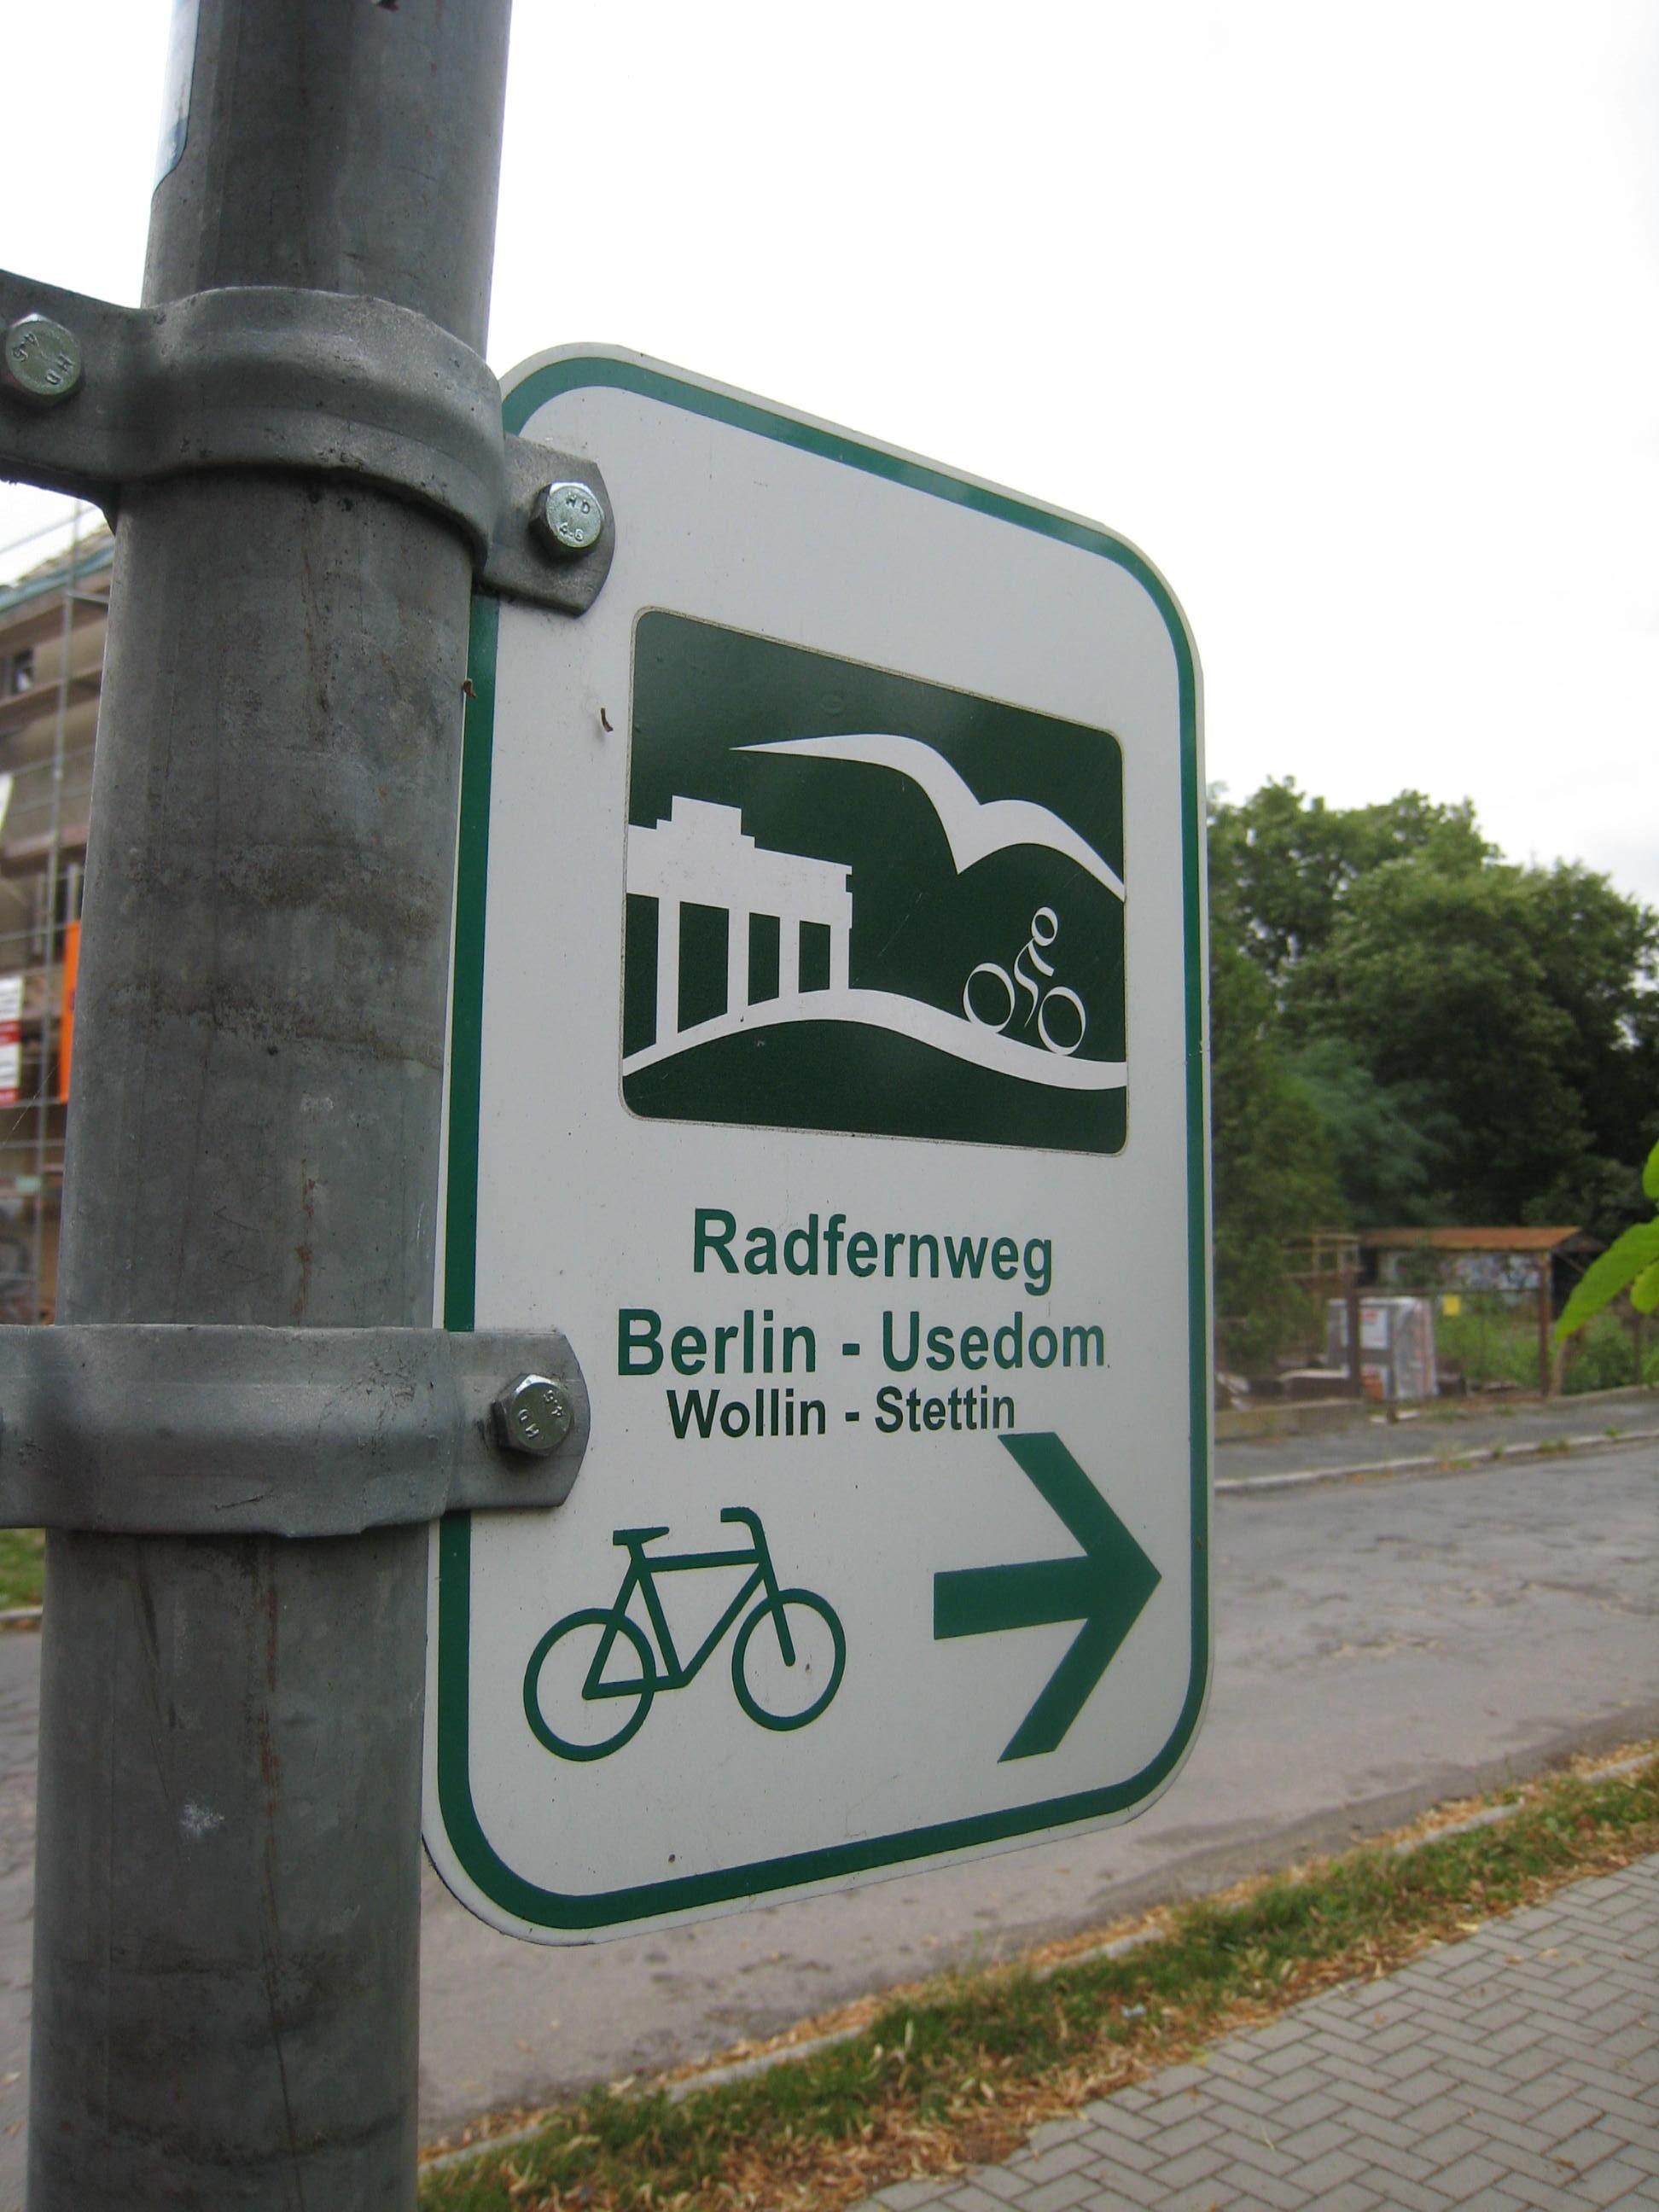 Radweg Berlin Usedom Karte.Radfernweg Berlin Usedom Reiseführer Auf Wikivoyage